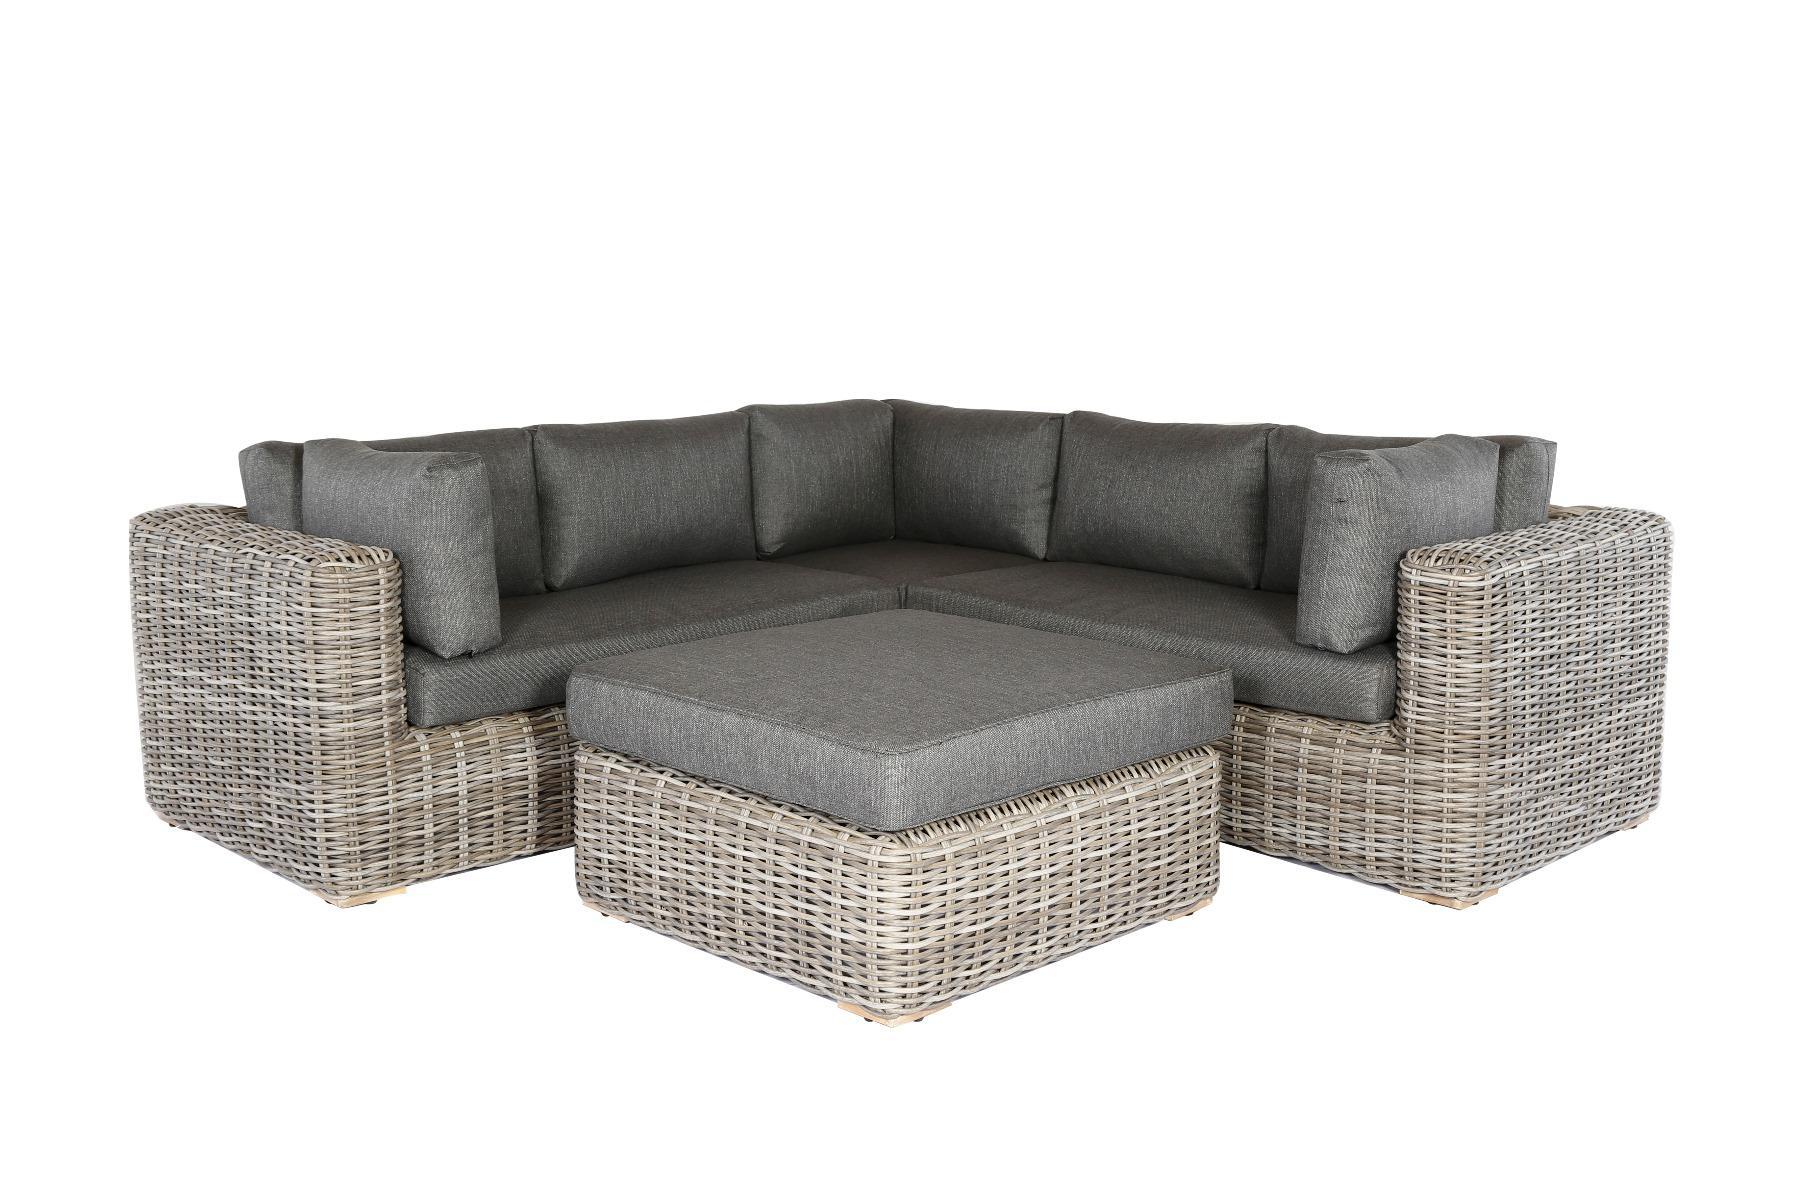 Korting Cervo lounge corner set 4pcs (left arm right arm corner table)